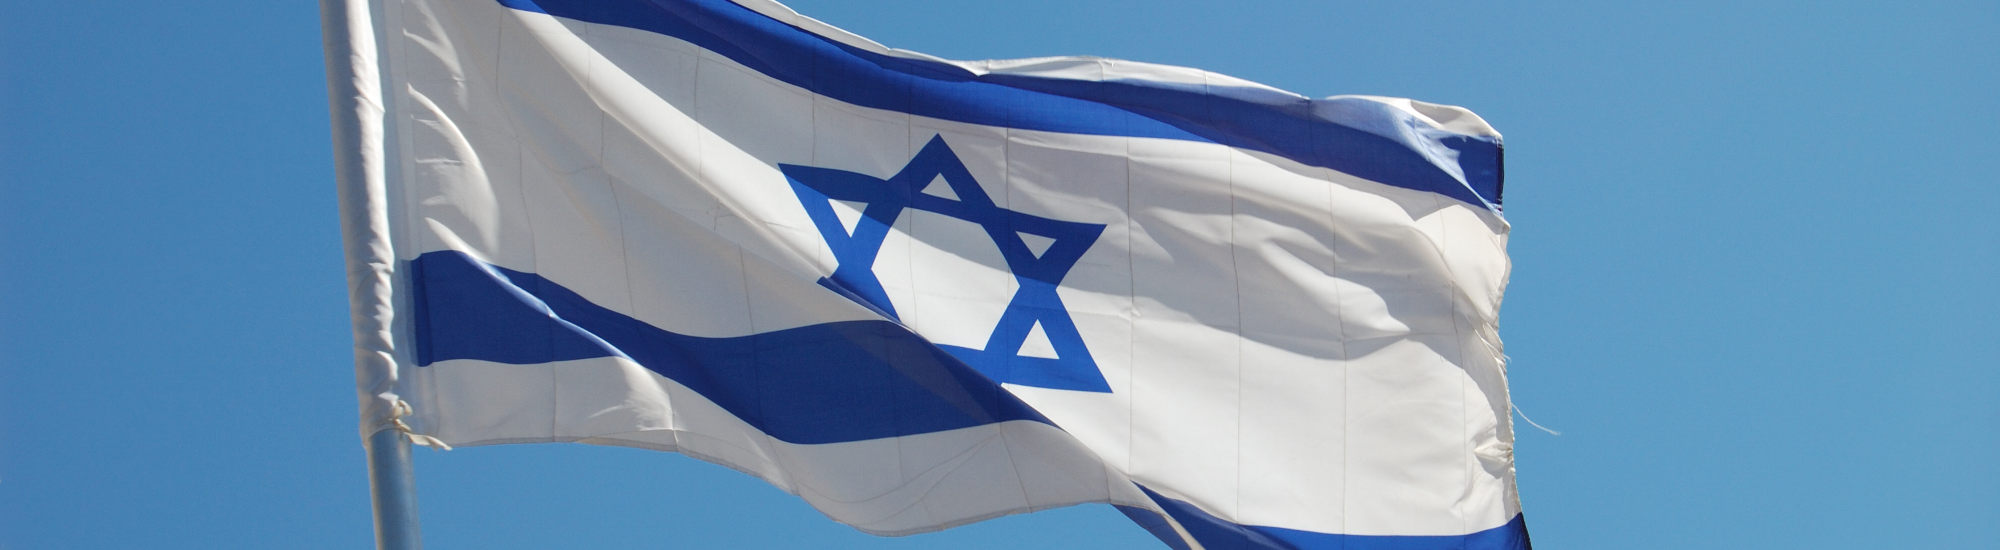 Unibes Cultural oferece curso de Hebraico Moderno aos domingos